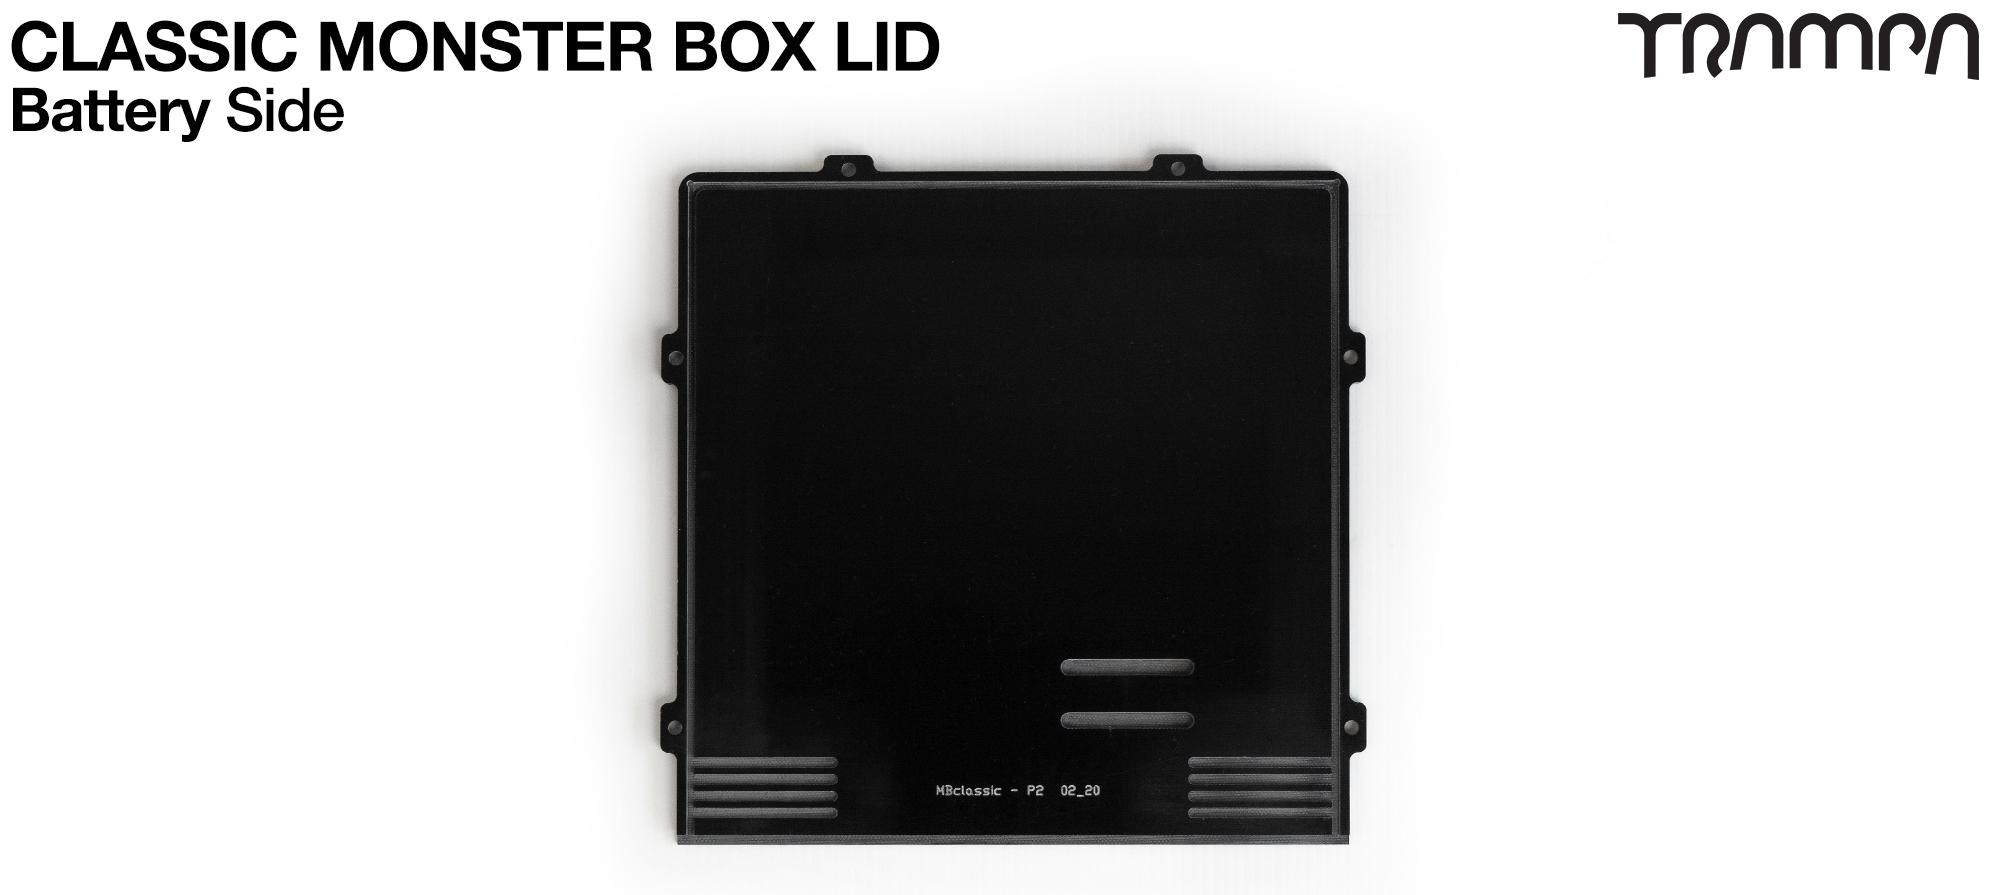 TRAMPA CLASSIC Monster Box MKV LID - Battery Side